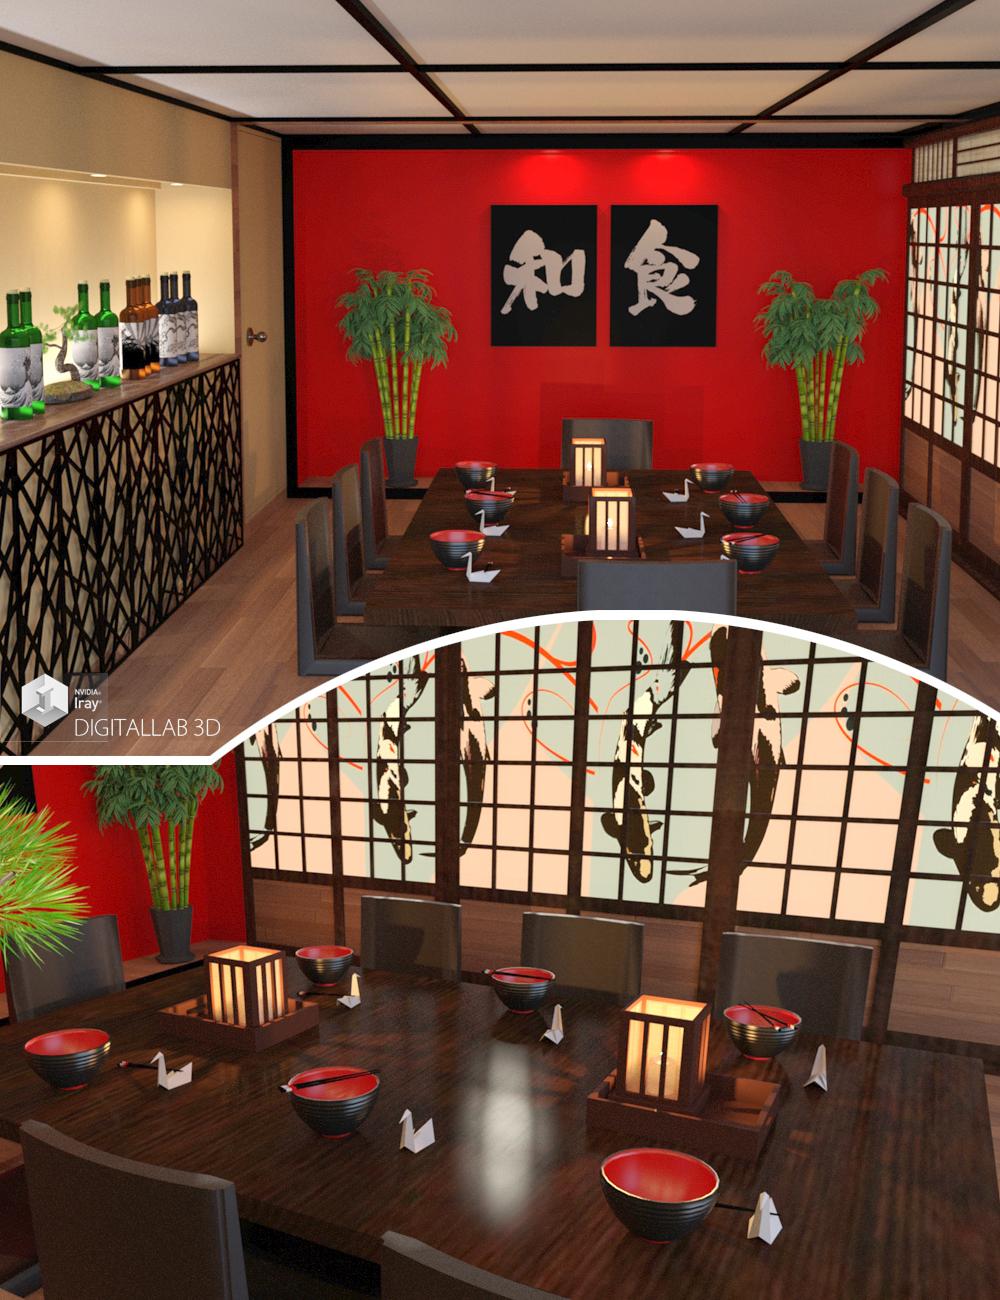 Japanese Restaurant by: Digitallab3D, 3D Models by Daz 3D